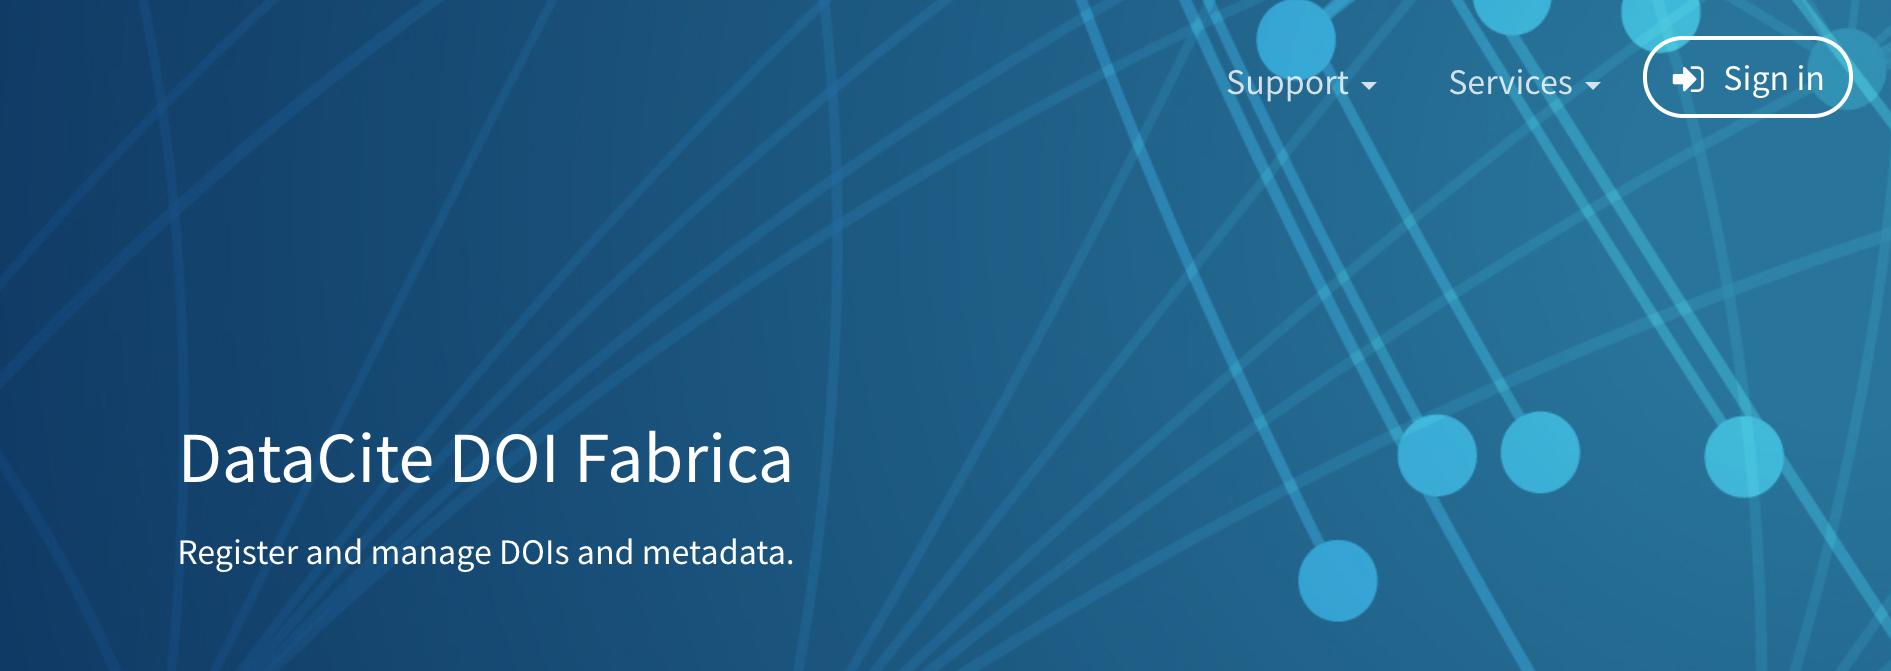 DOI Fabrica: main page